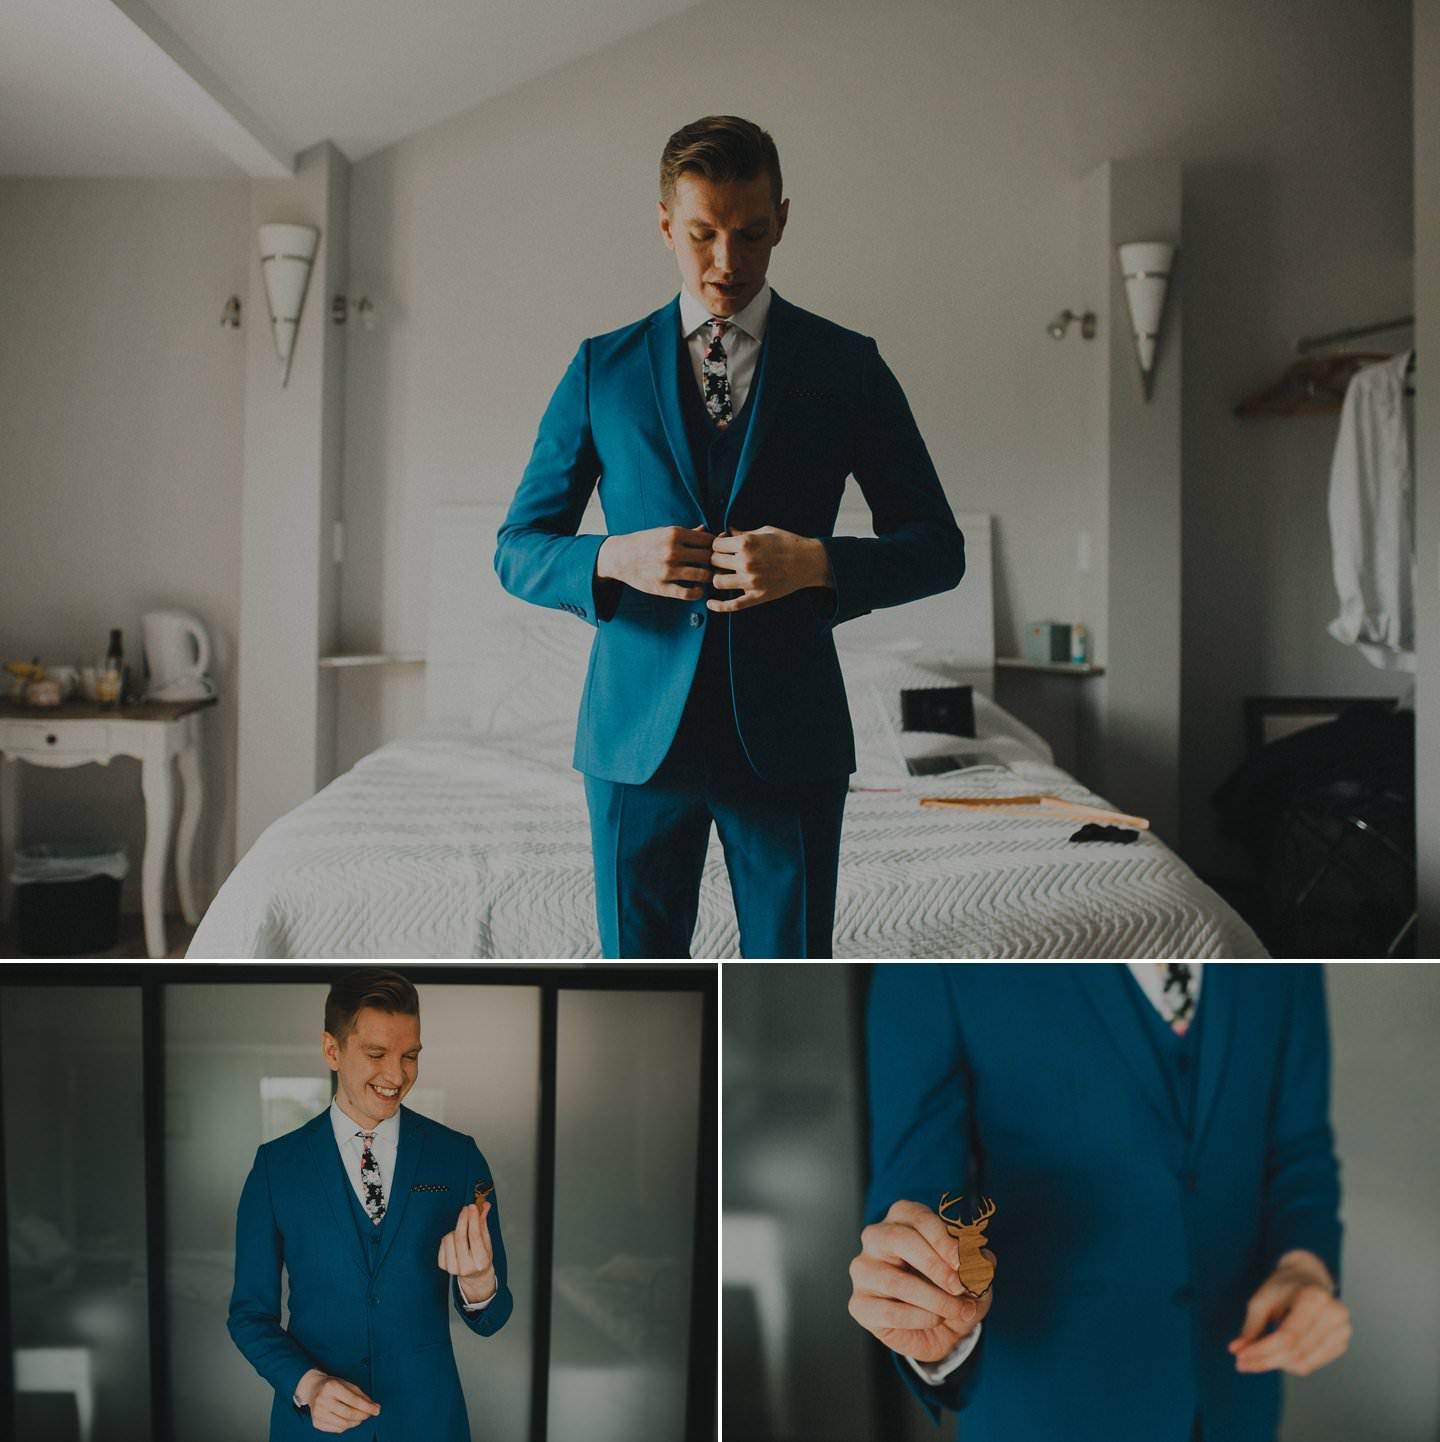 Stylish alternative groom wearing cobalt blue suit